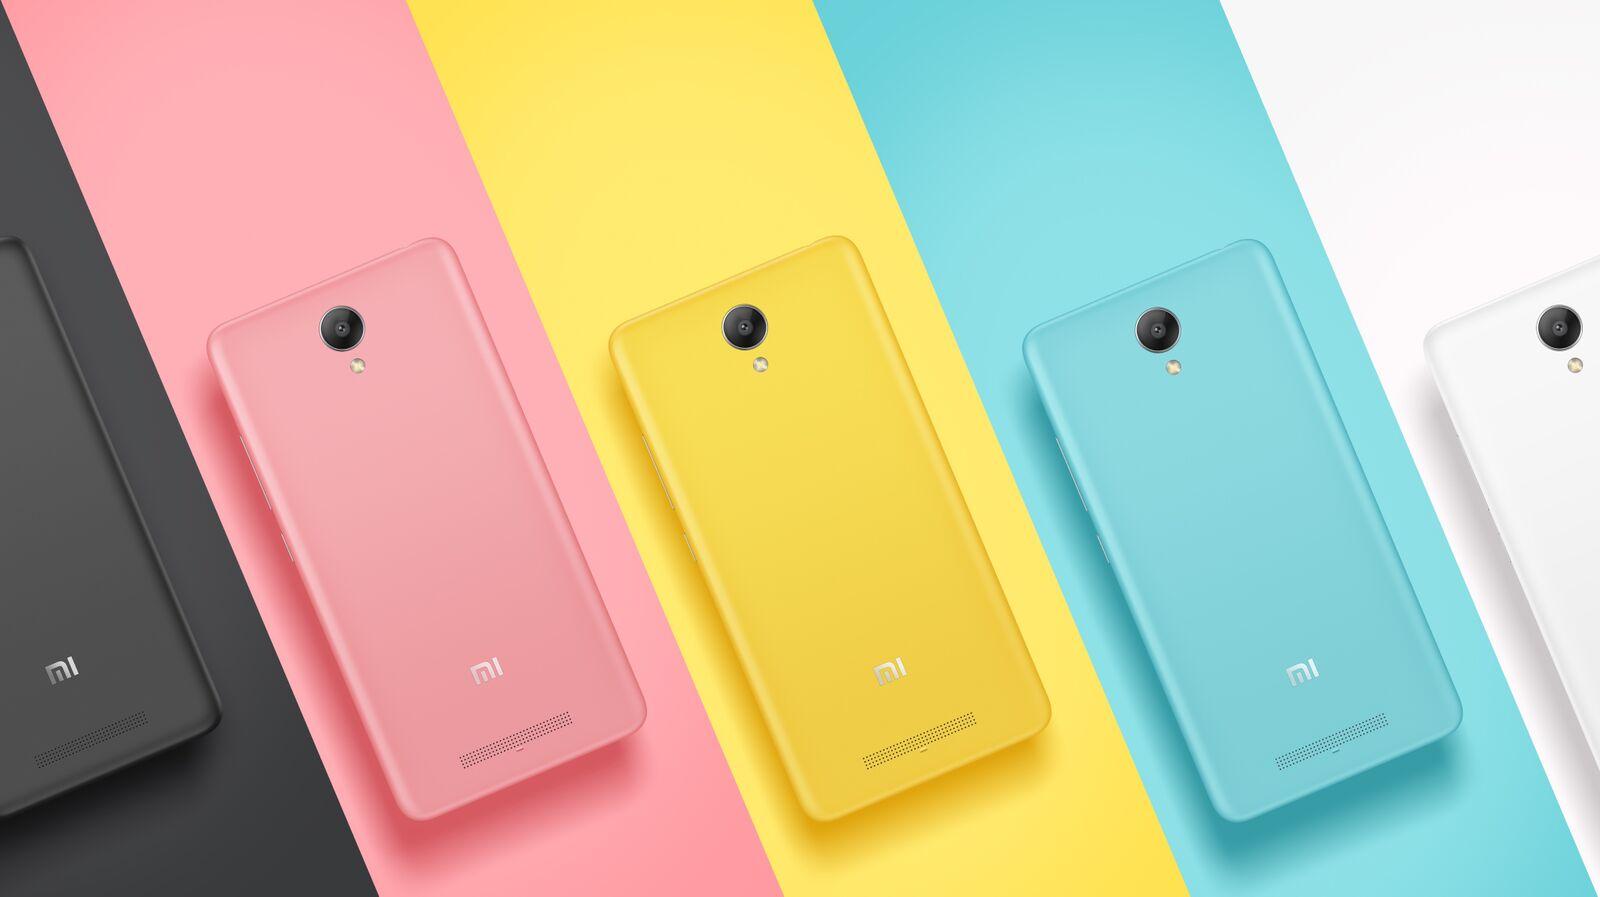 Xiaomi Redmi Note 2 Offers Octa Core Power At A Budget Digital